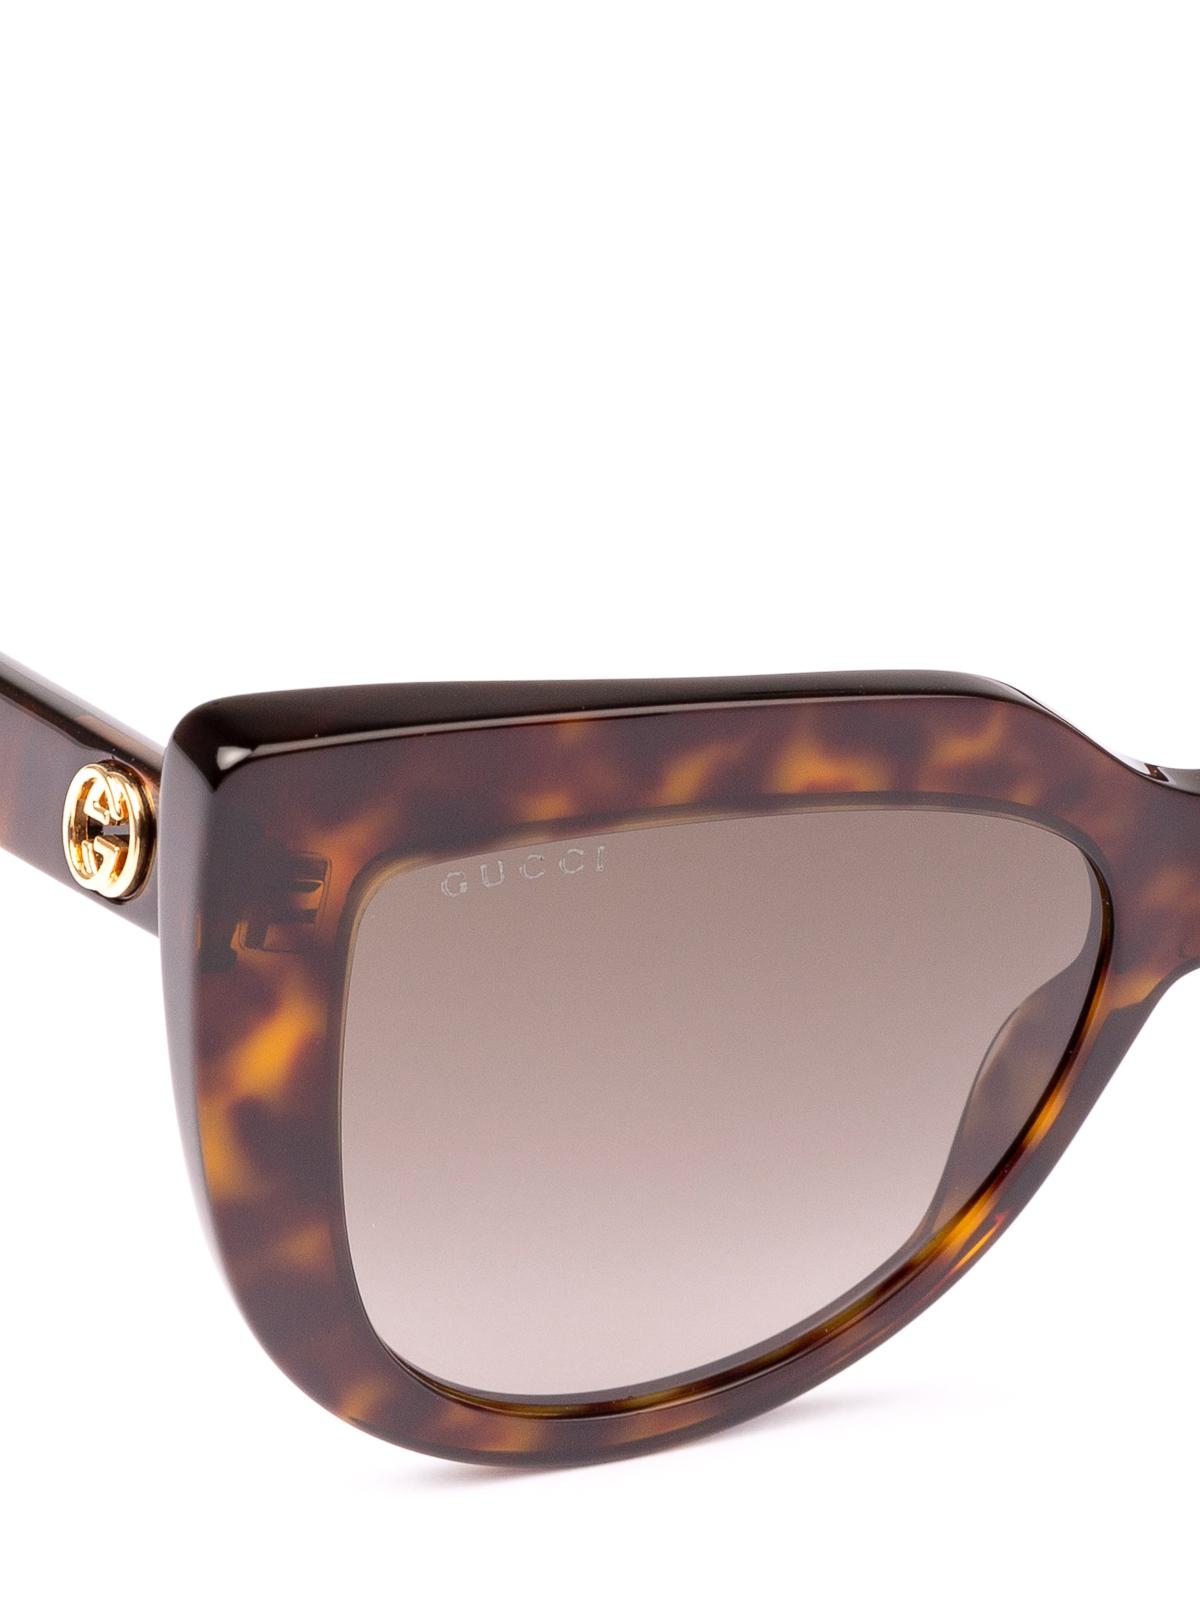 b6073de2ae6 Gucci - Dark havana cat eye sunglasses - sunglasses - GG0164S 002